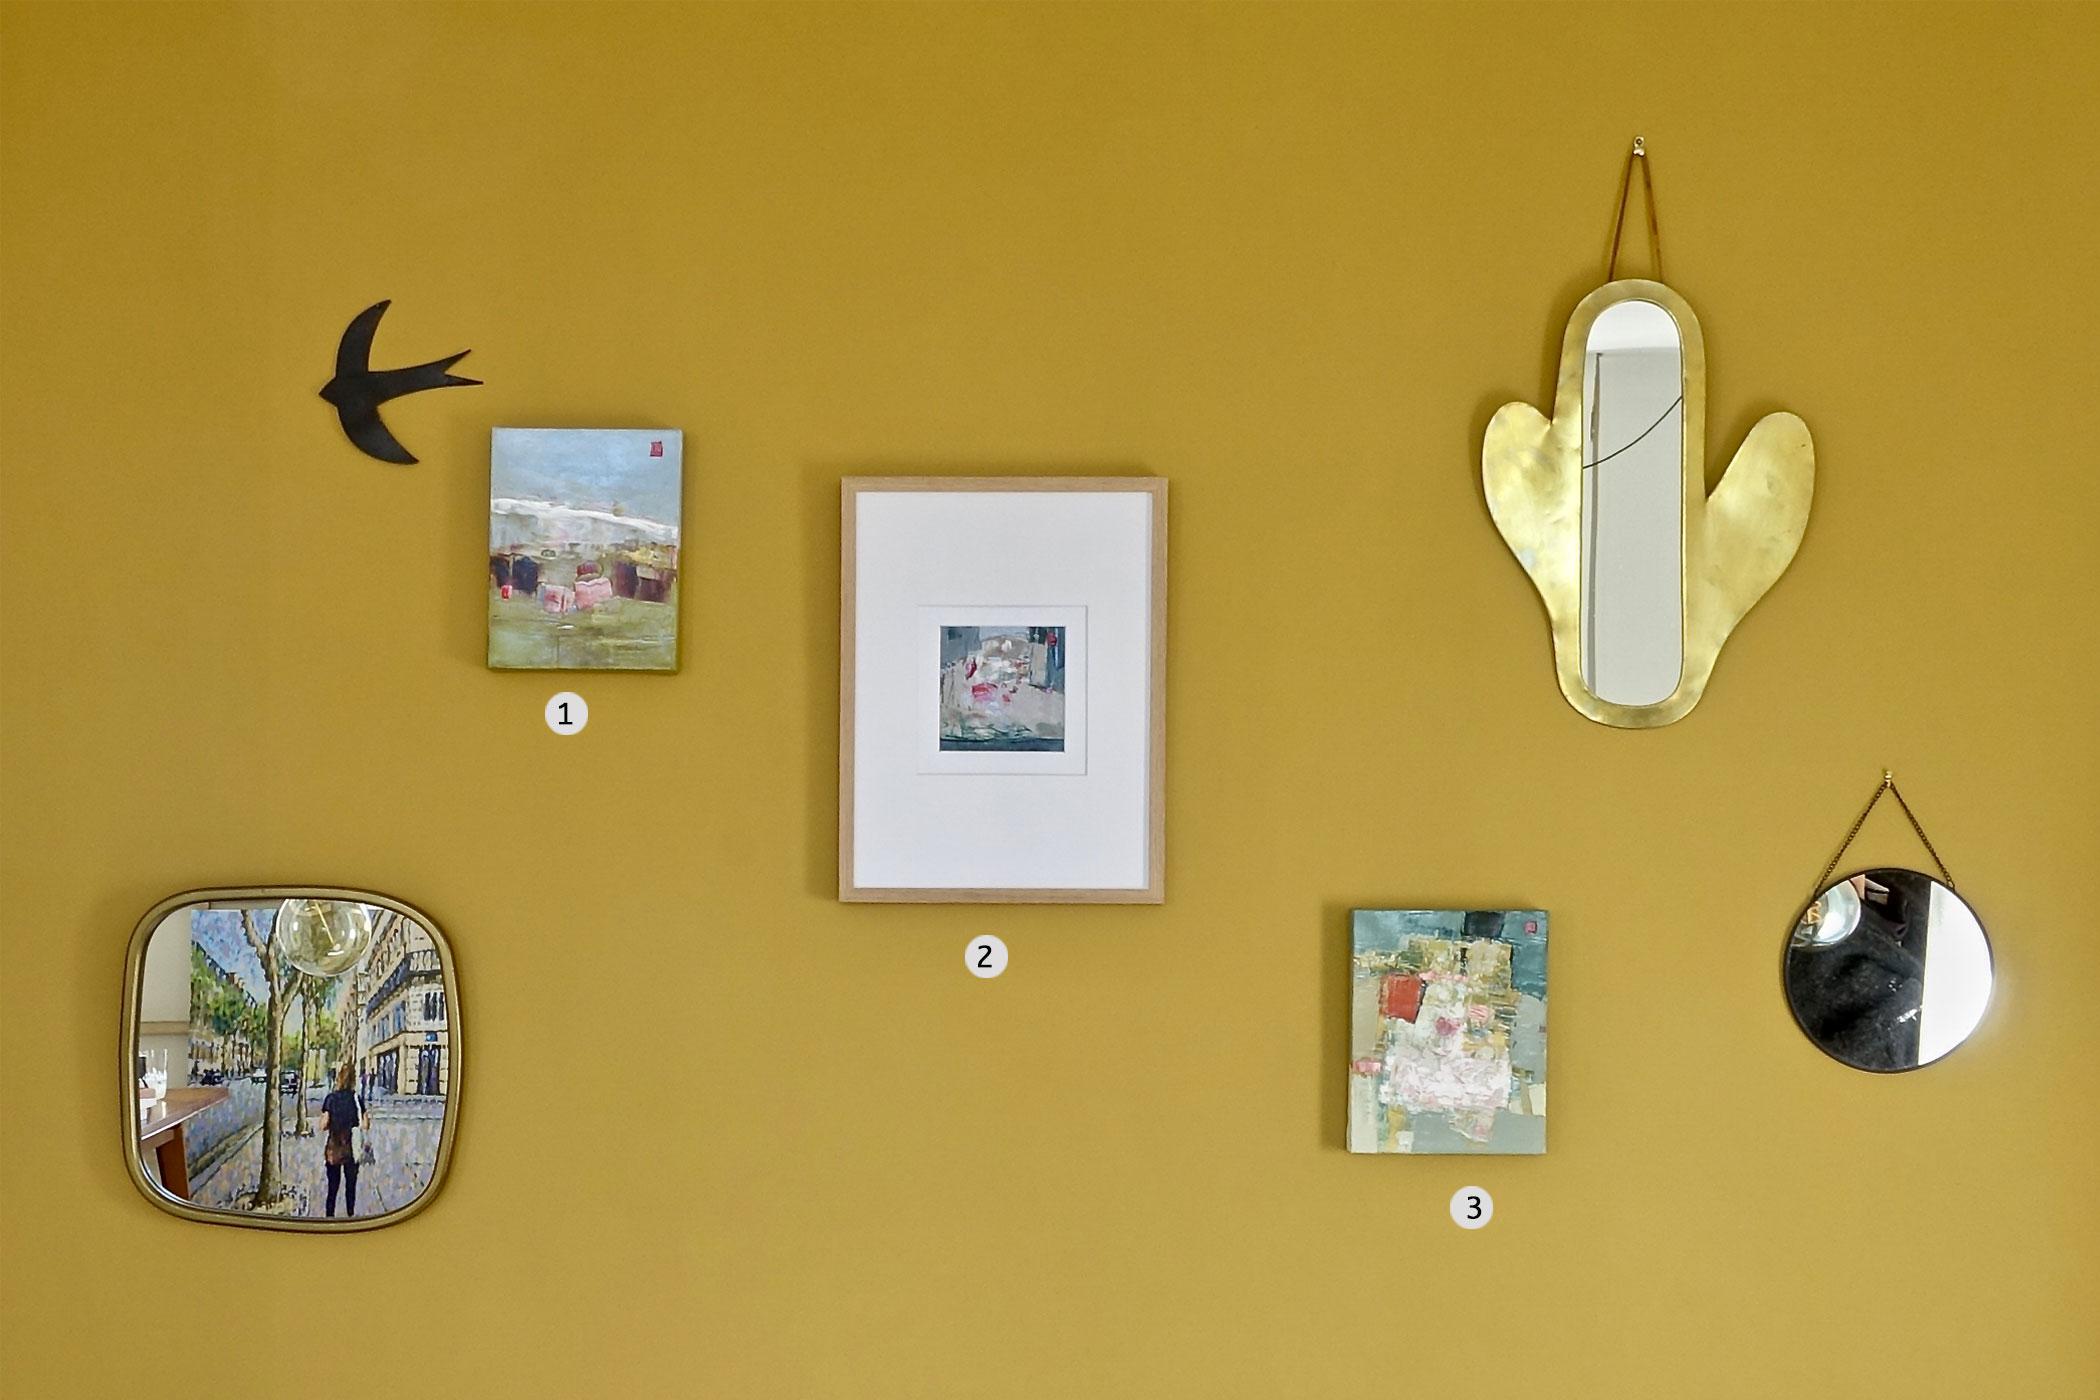 Oeuvres contemporaines - mur couleur ocre